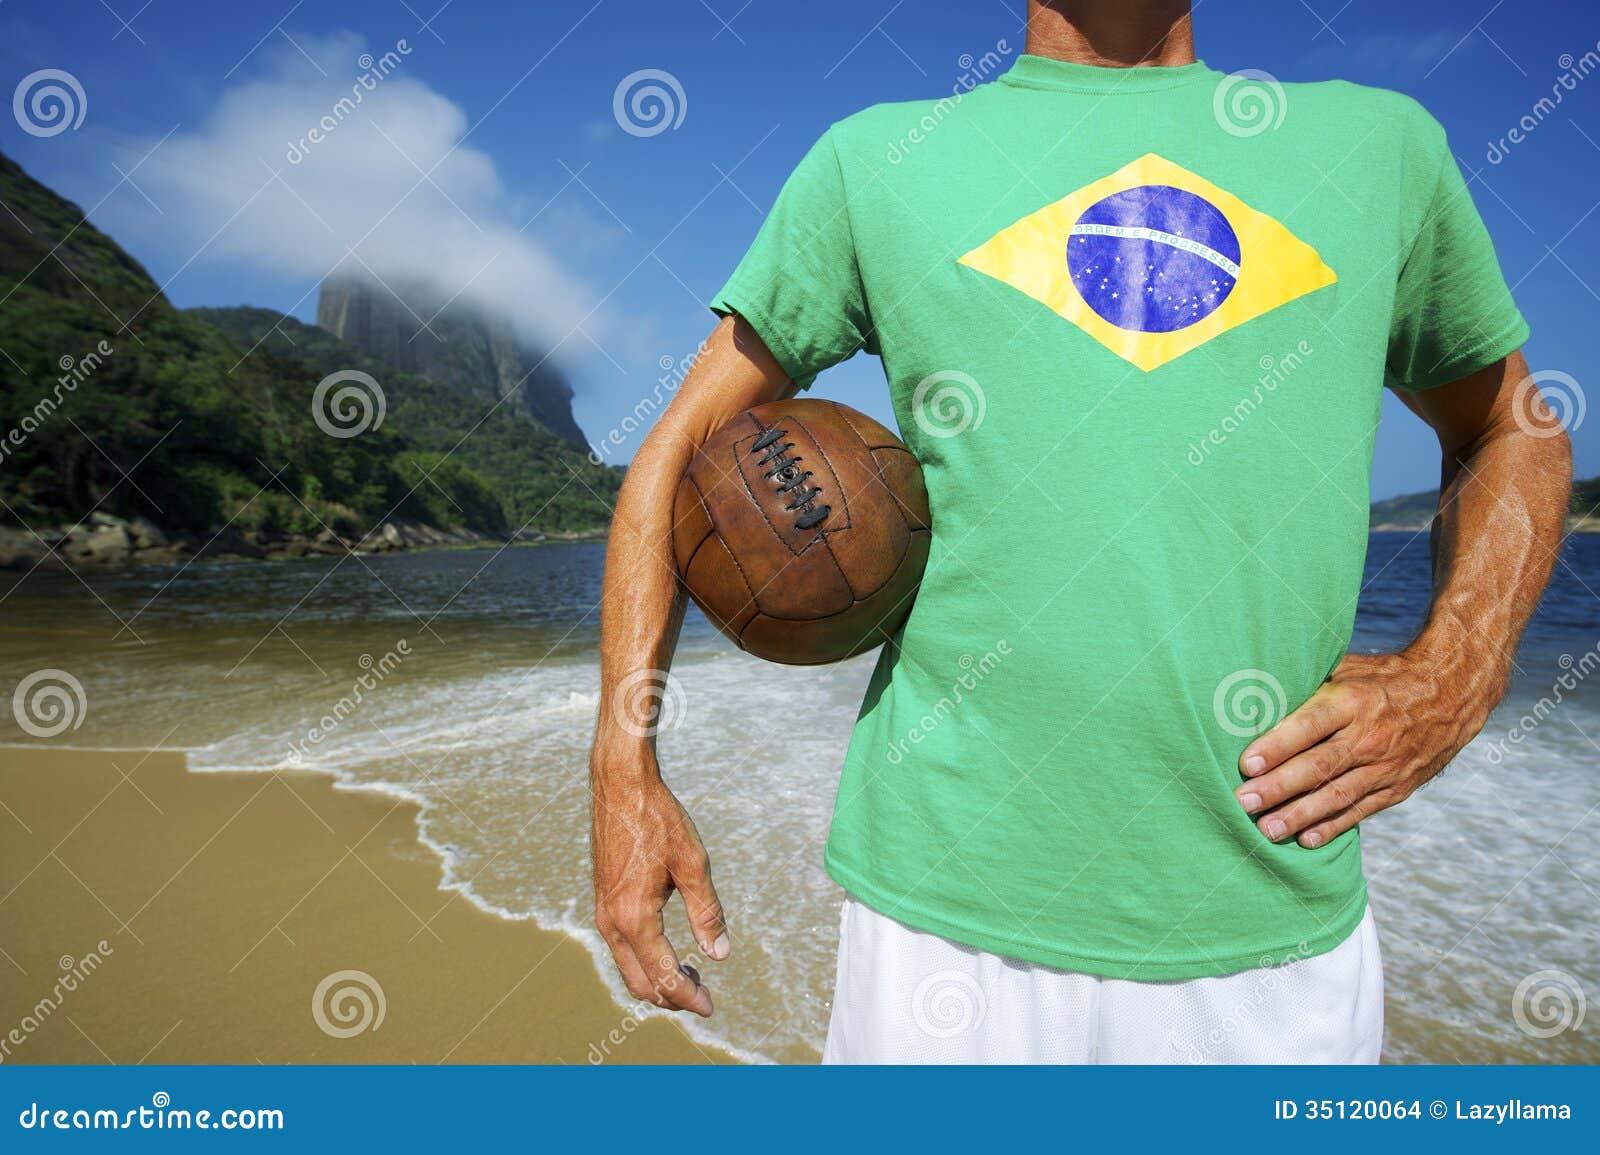 Brazilian Soccer Football Player Stands on Rio Beach